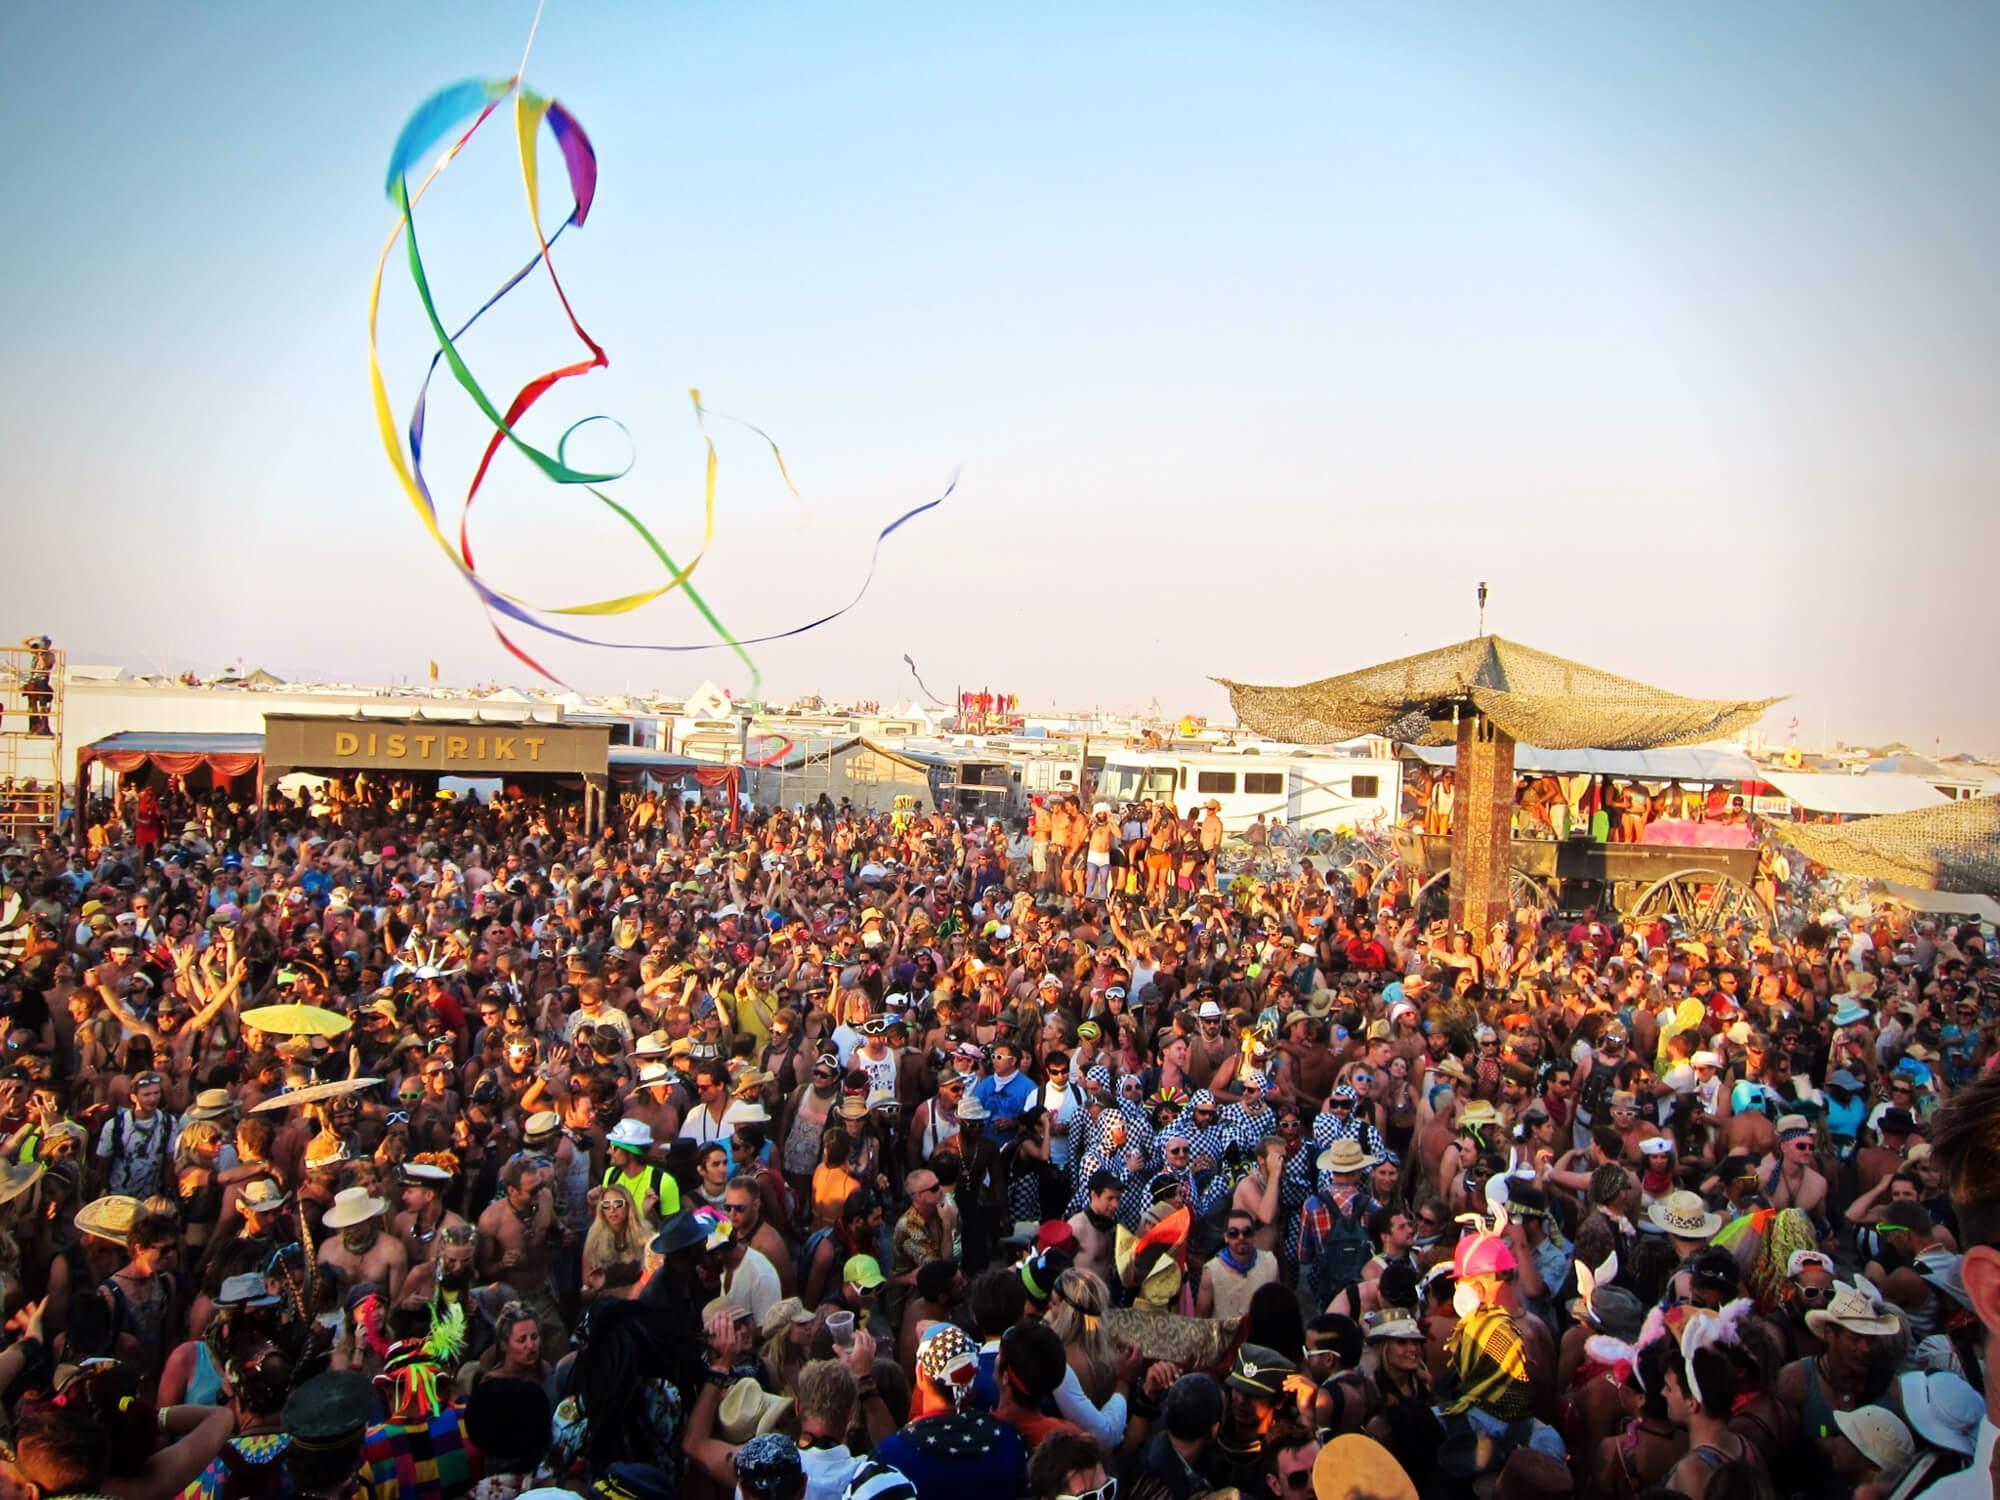 Distrikt Camp at Burning Man